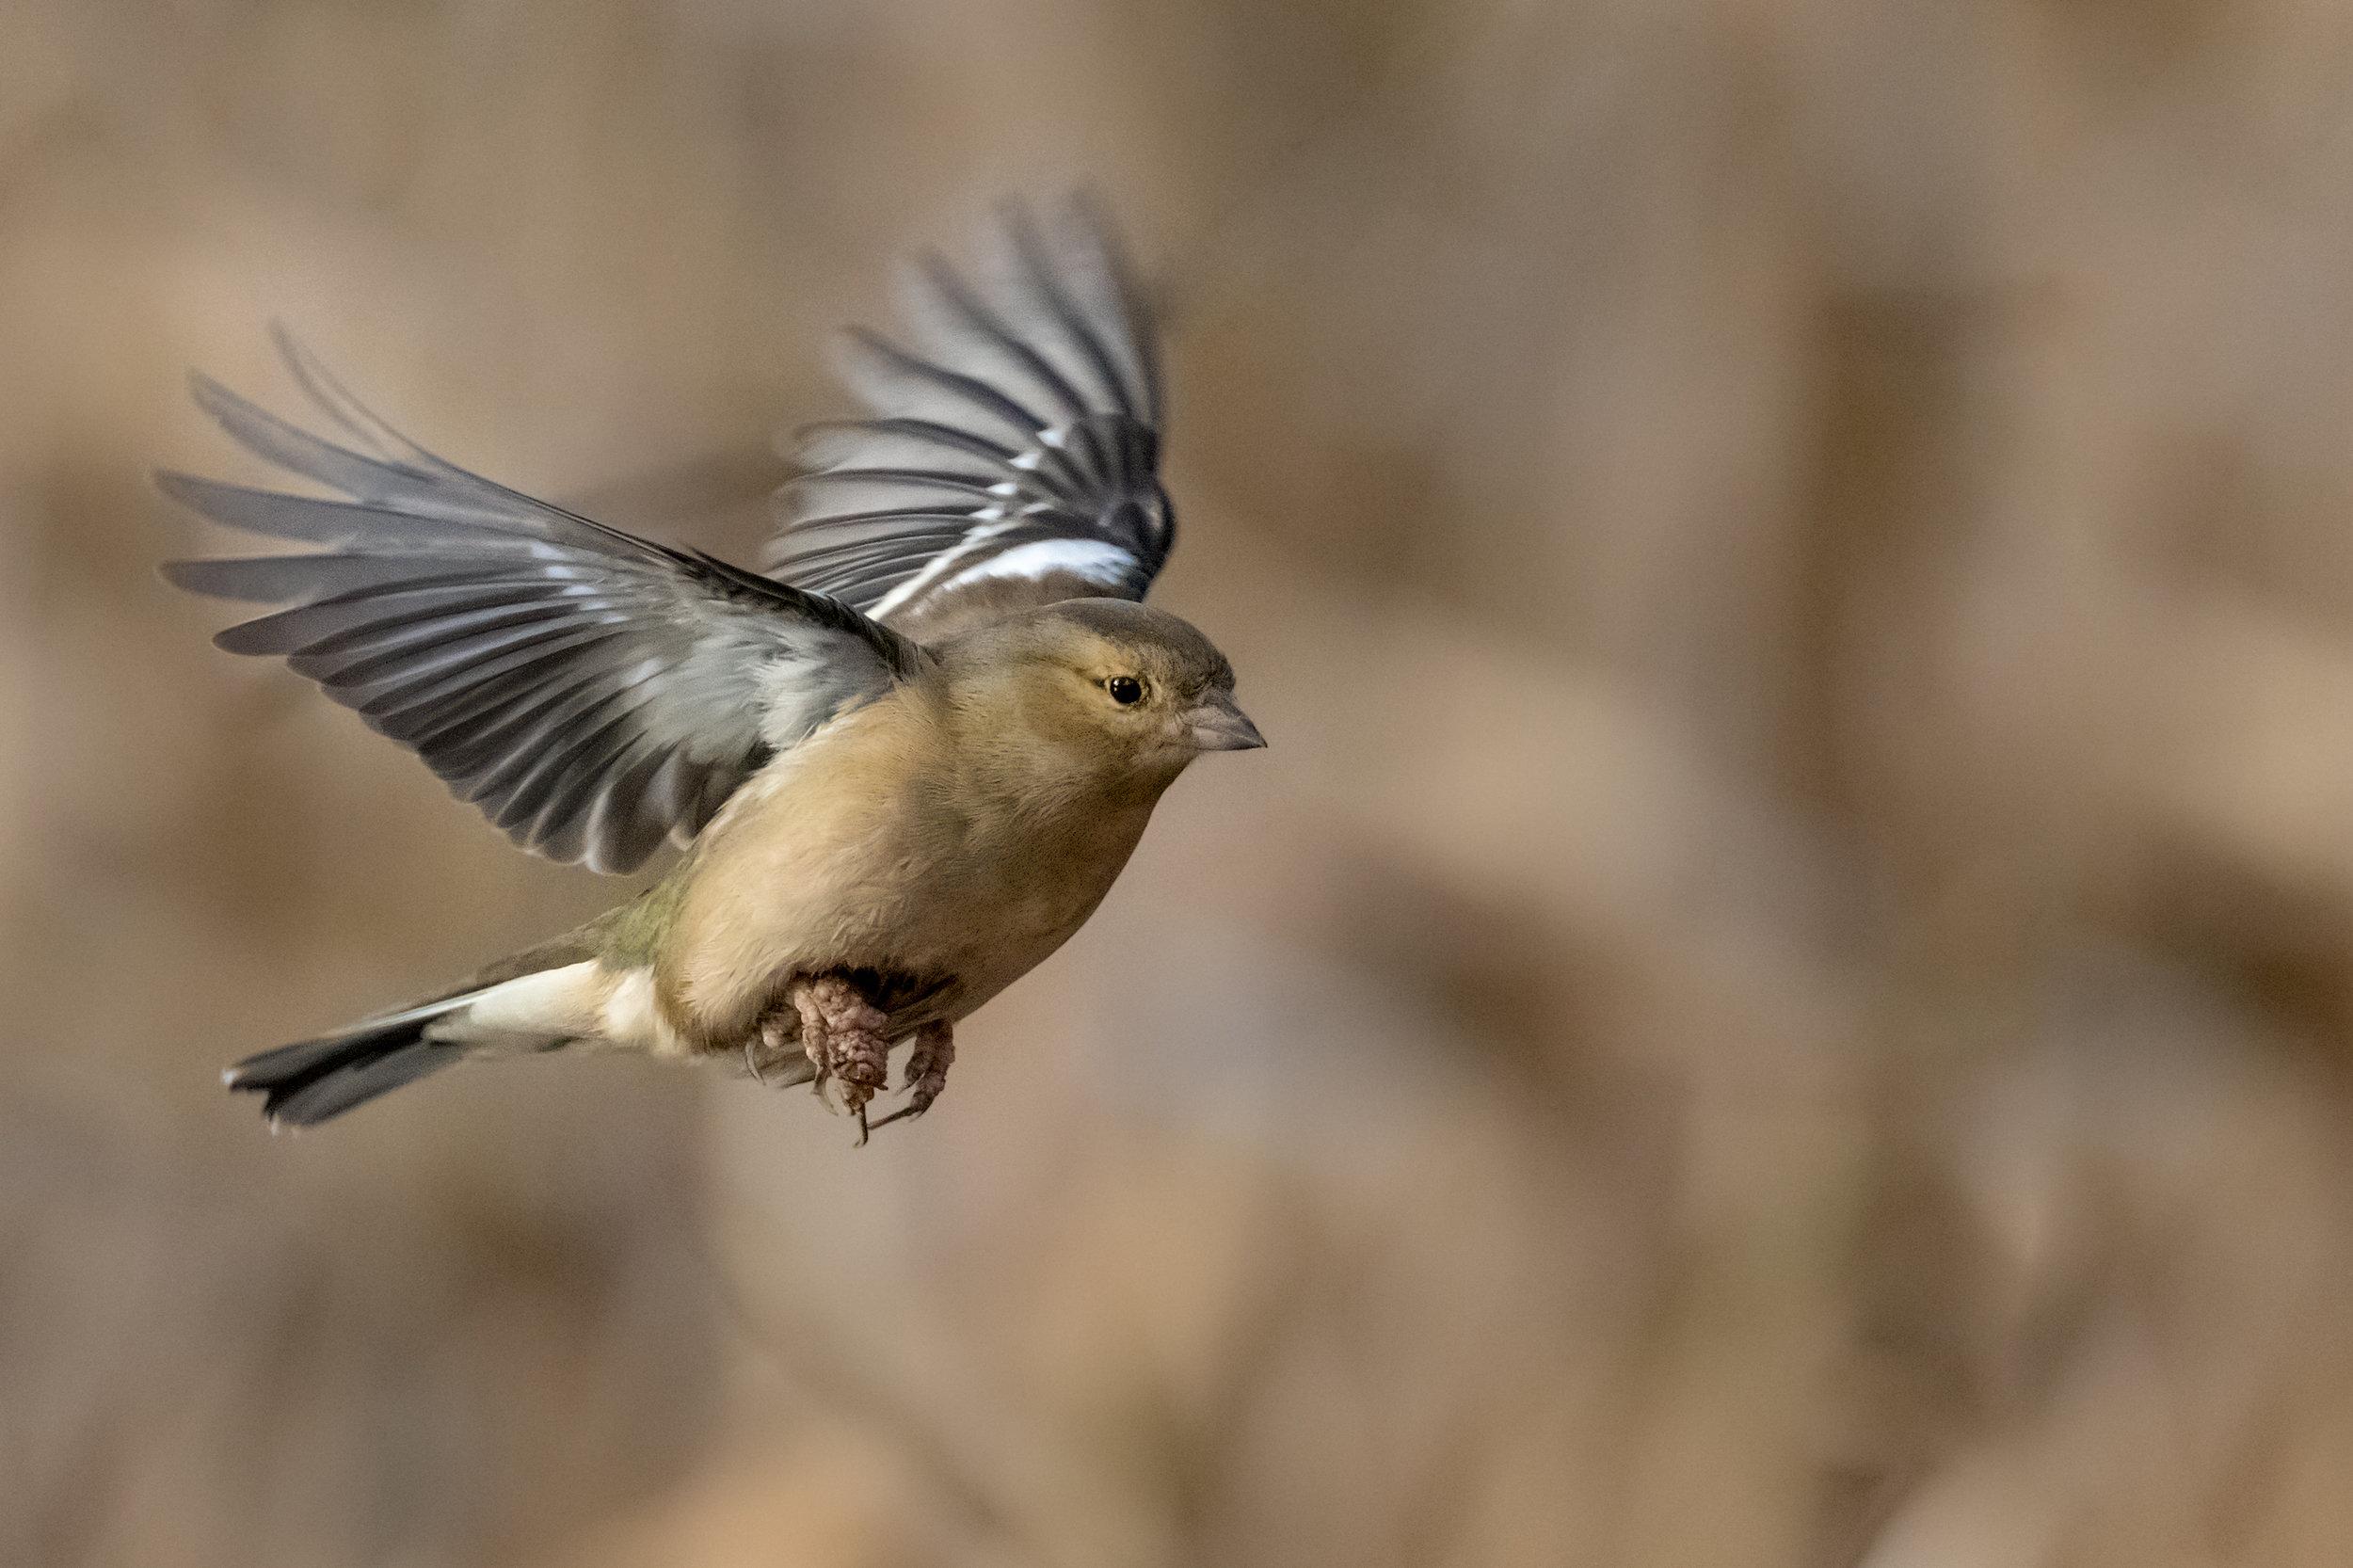 Female Chaffinch flypast